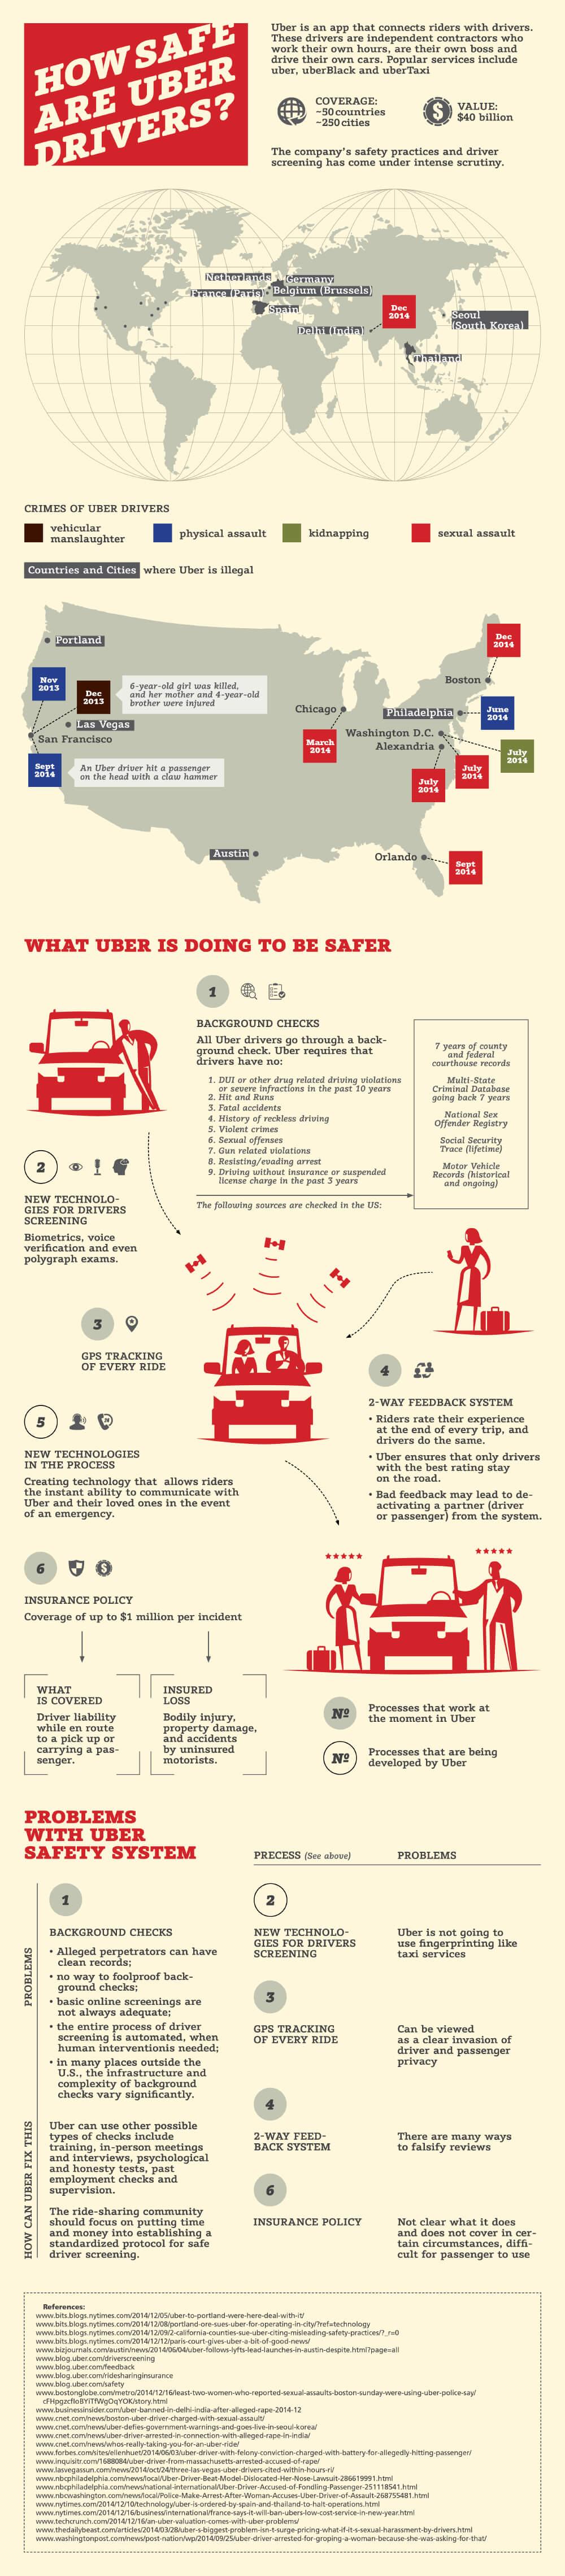 How Safe is Uber